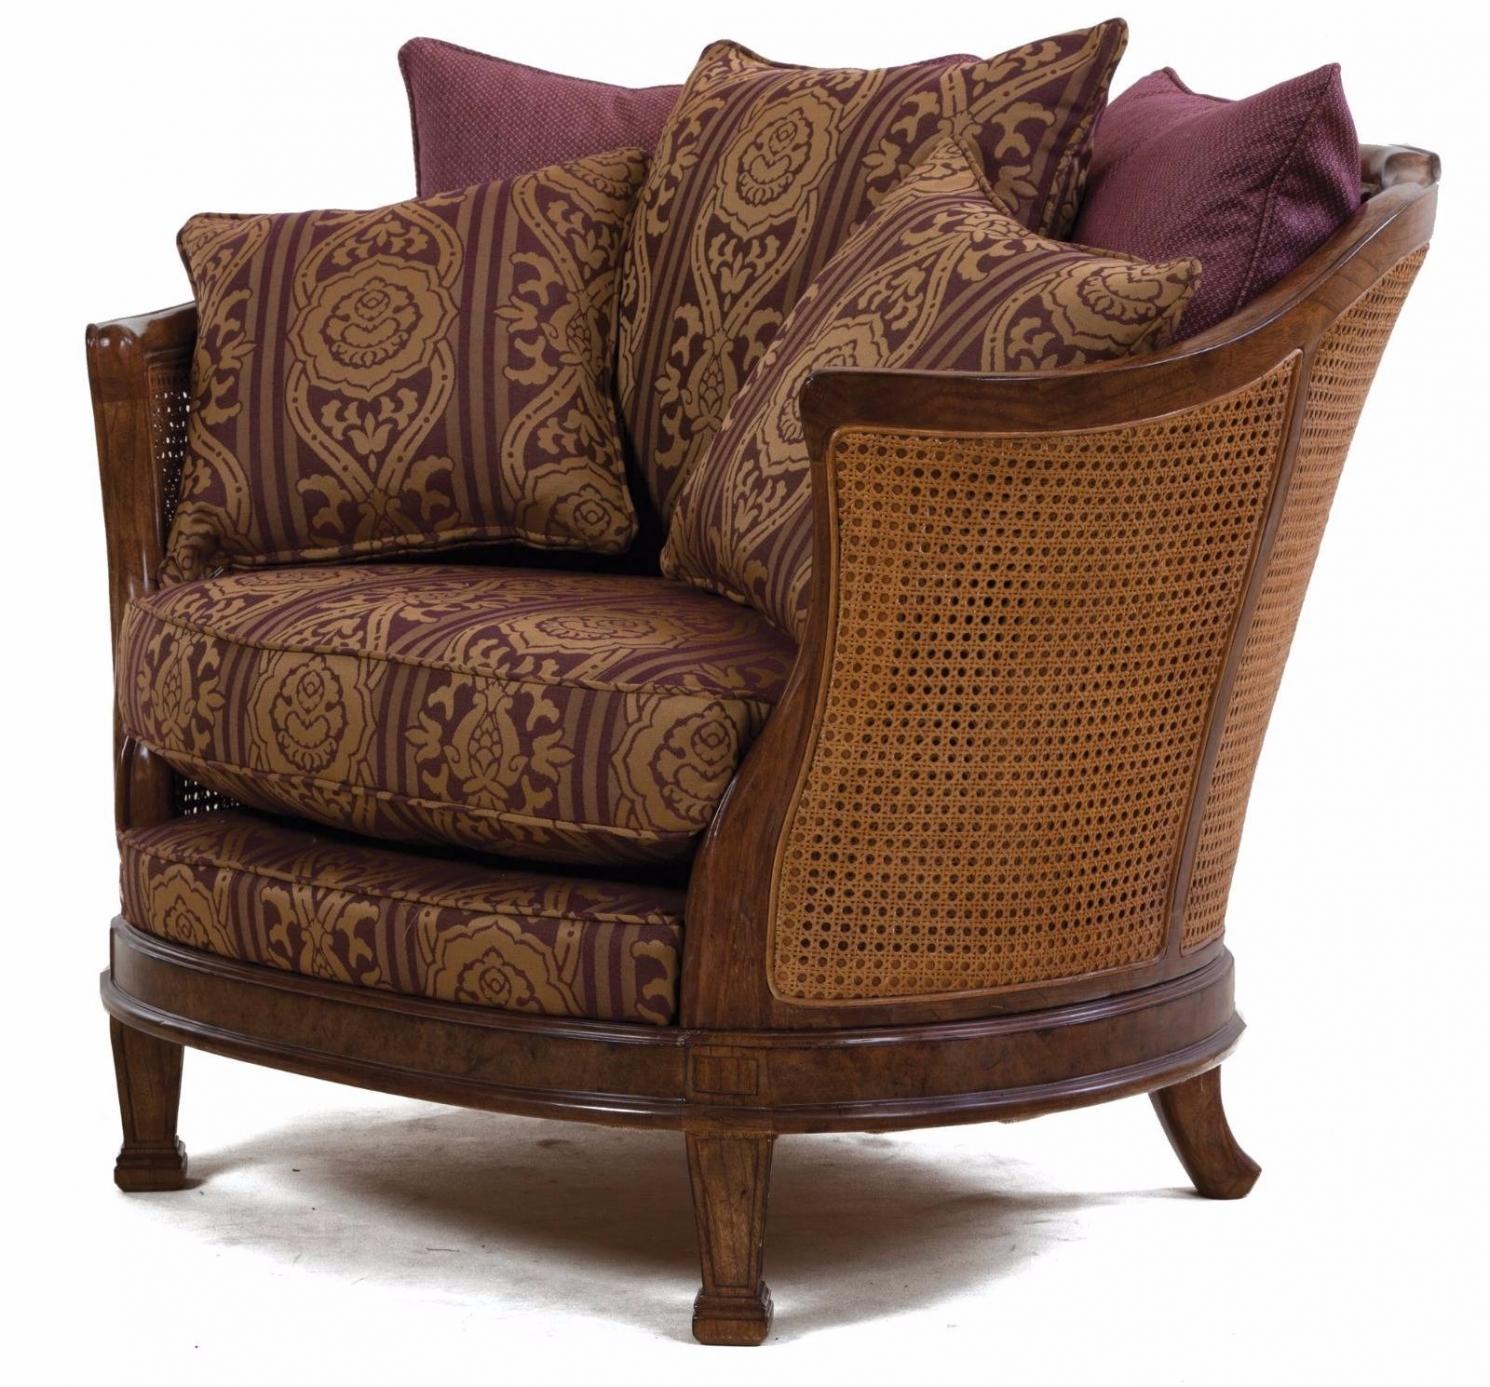 Mauretania chair in heather damask